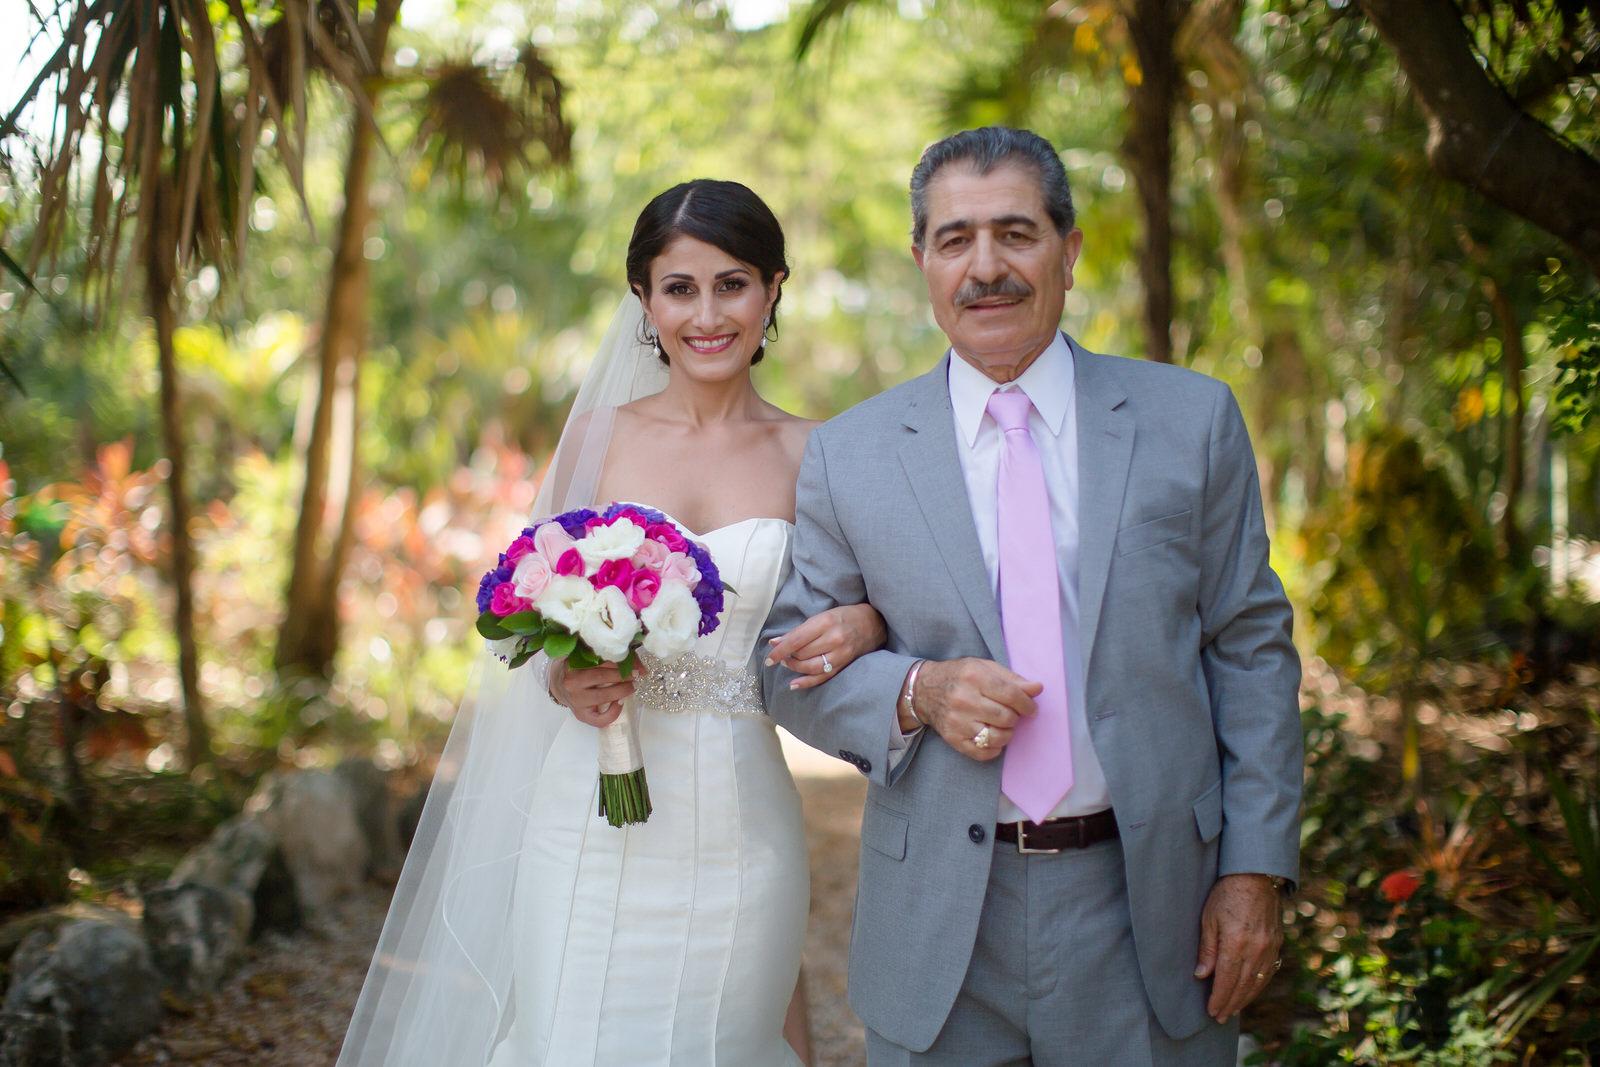 bride_and_father_wedding_ceremony_mexico.jpg